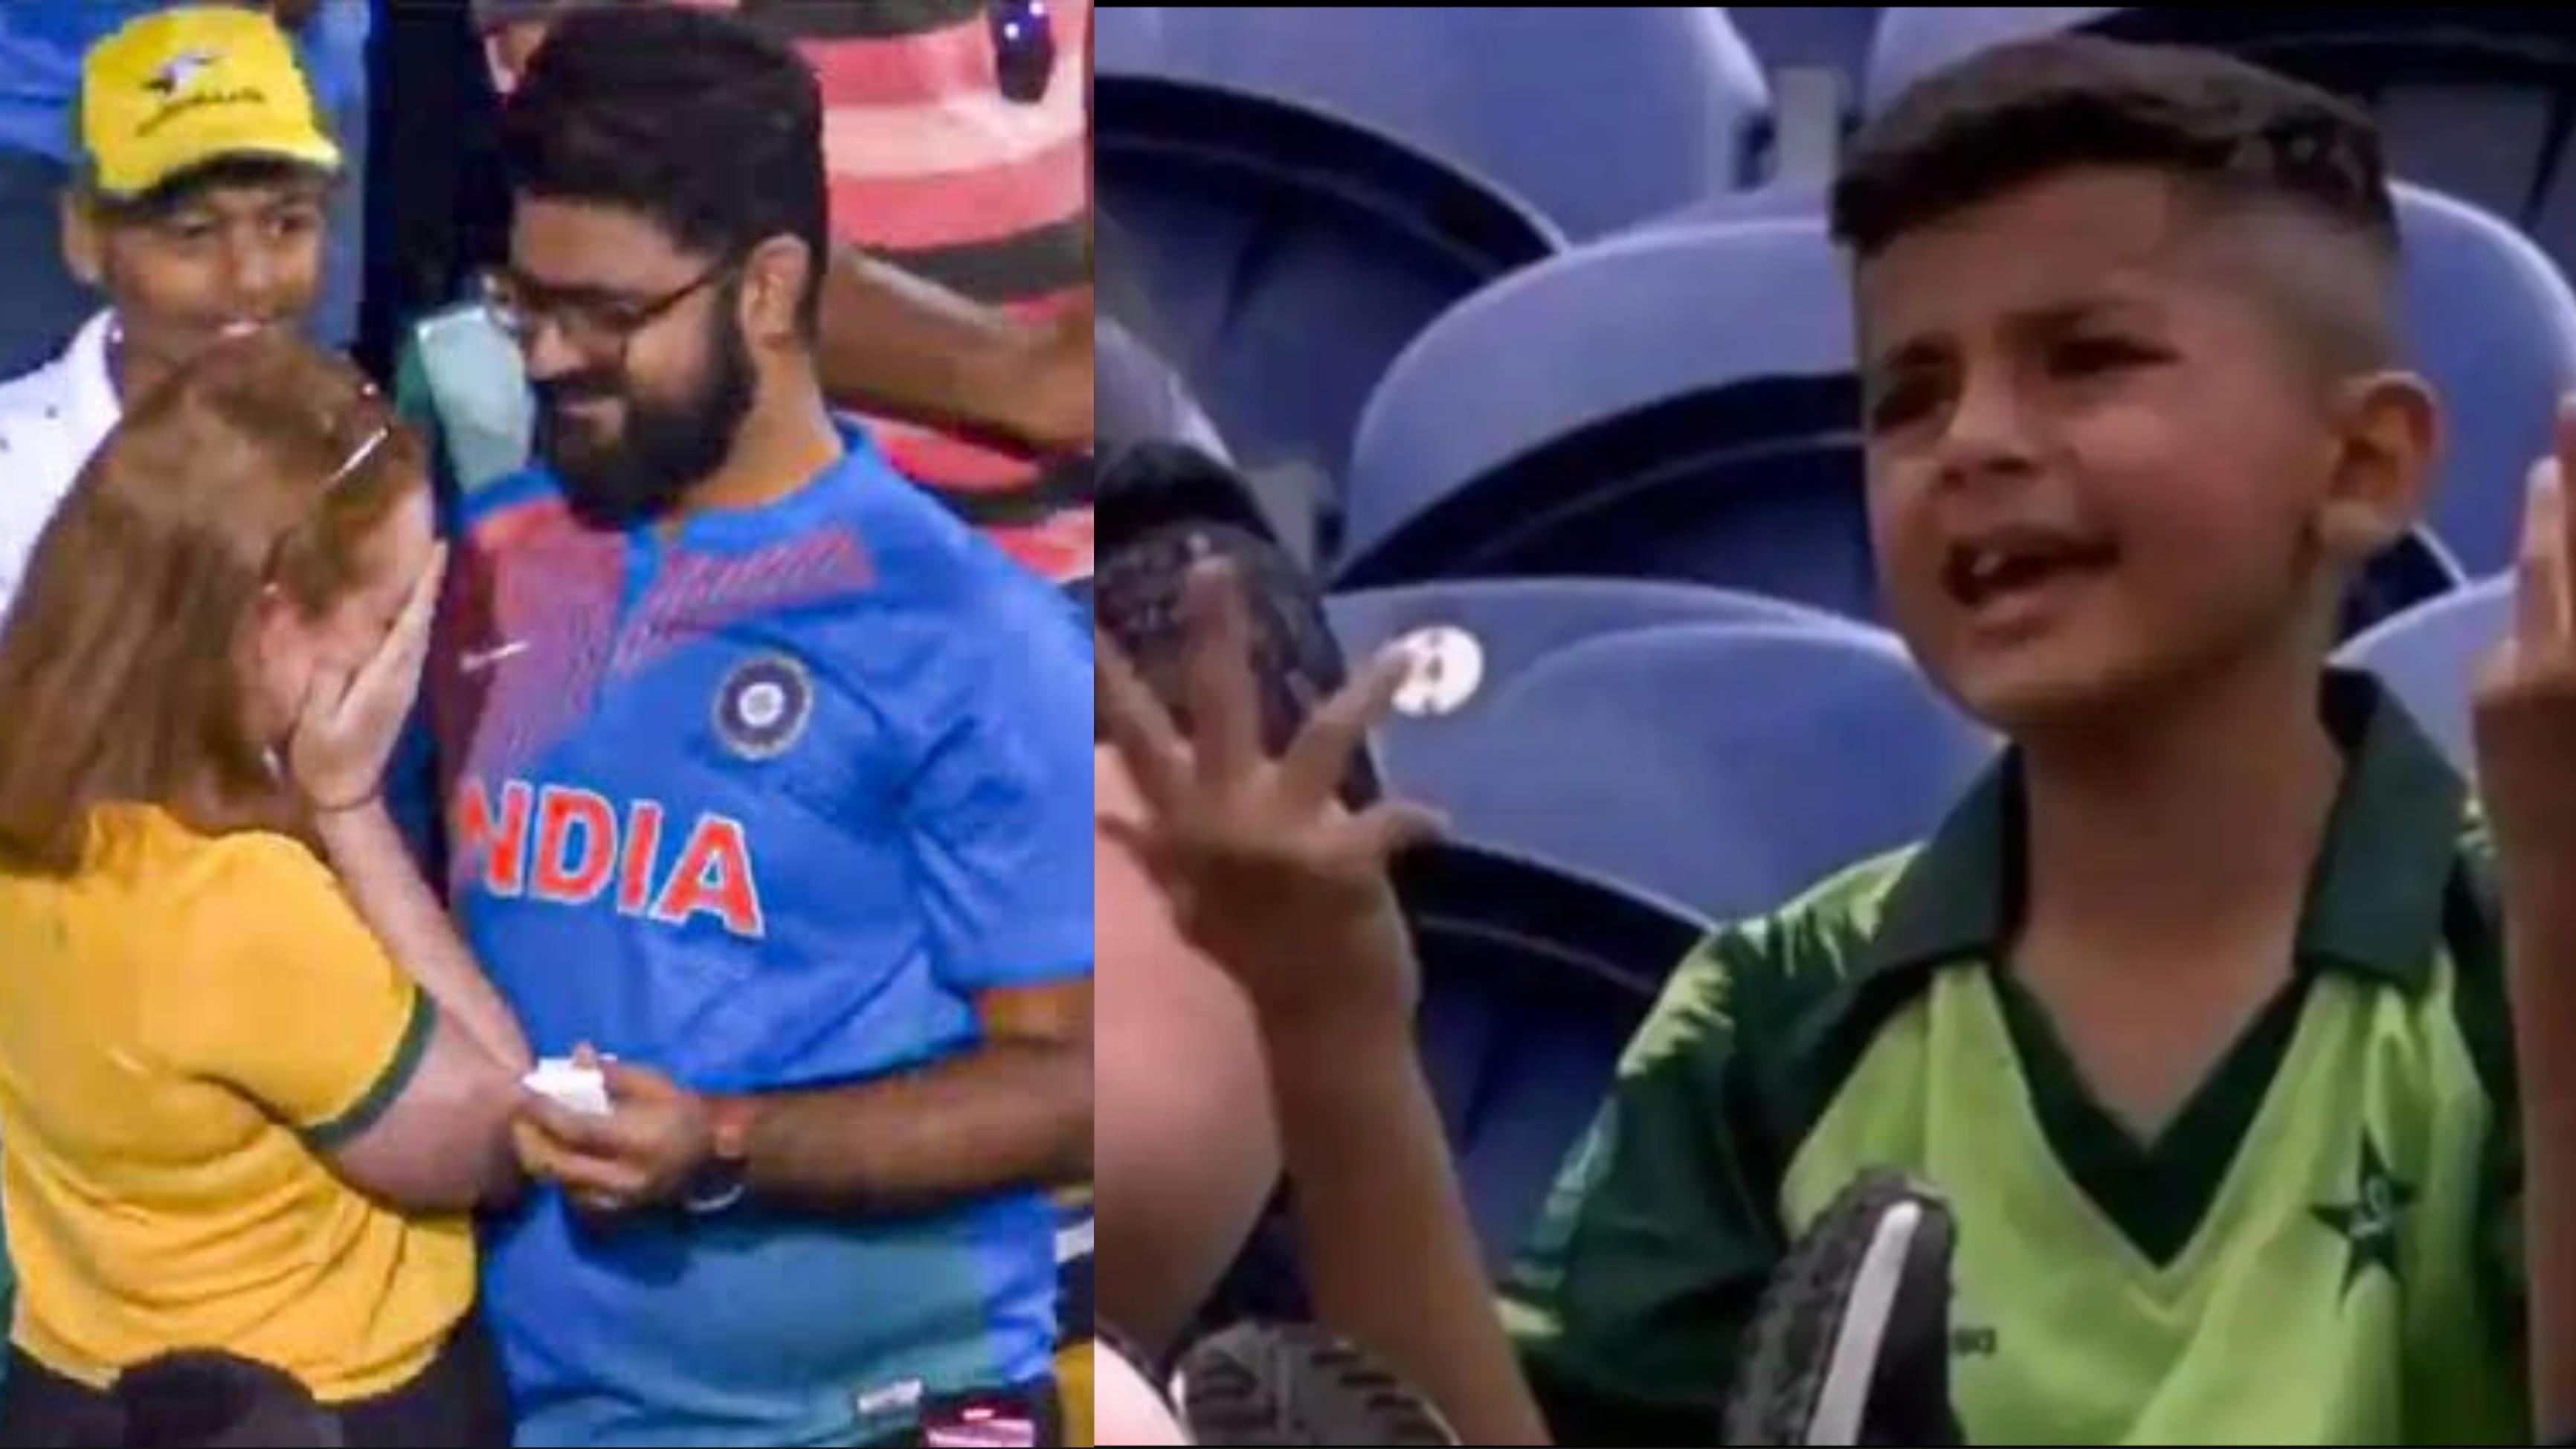 Cricket matches at stadiums